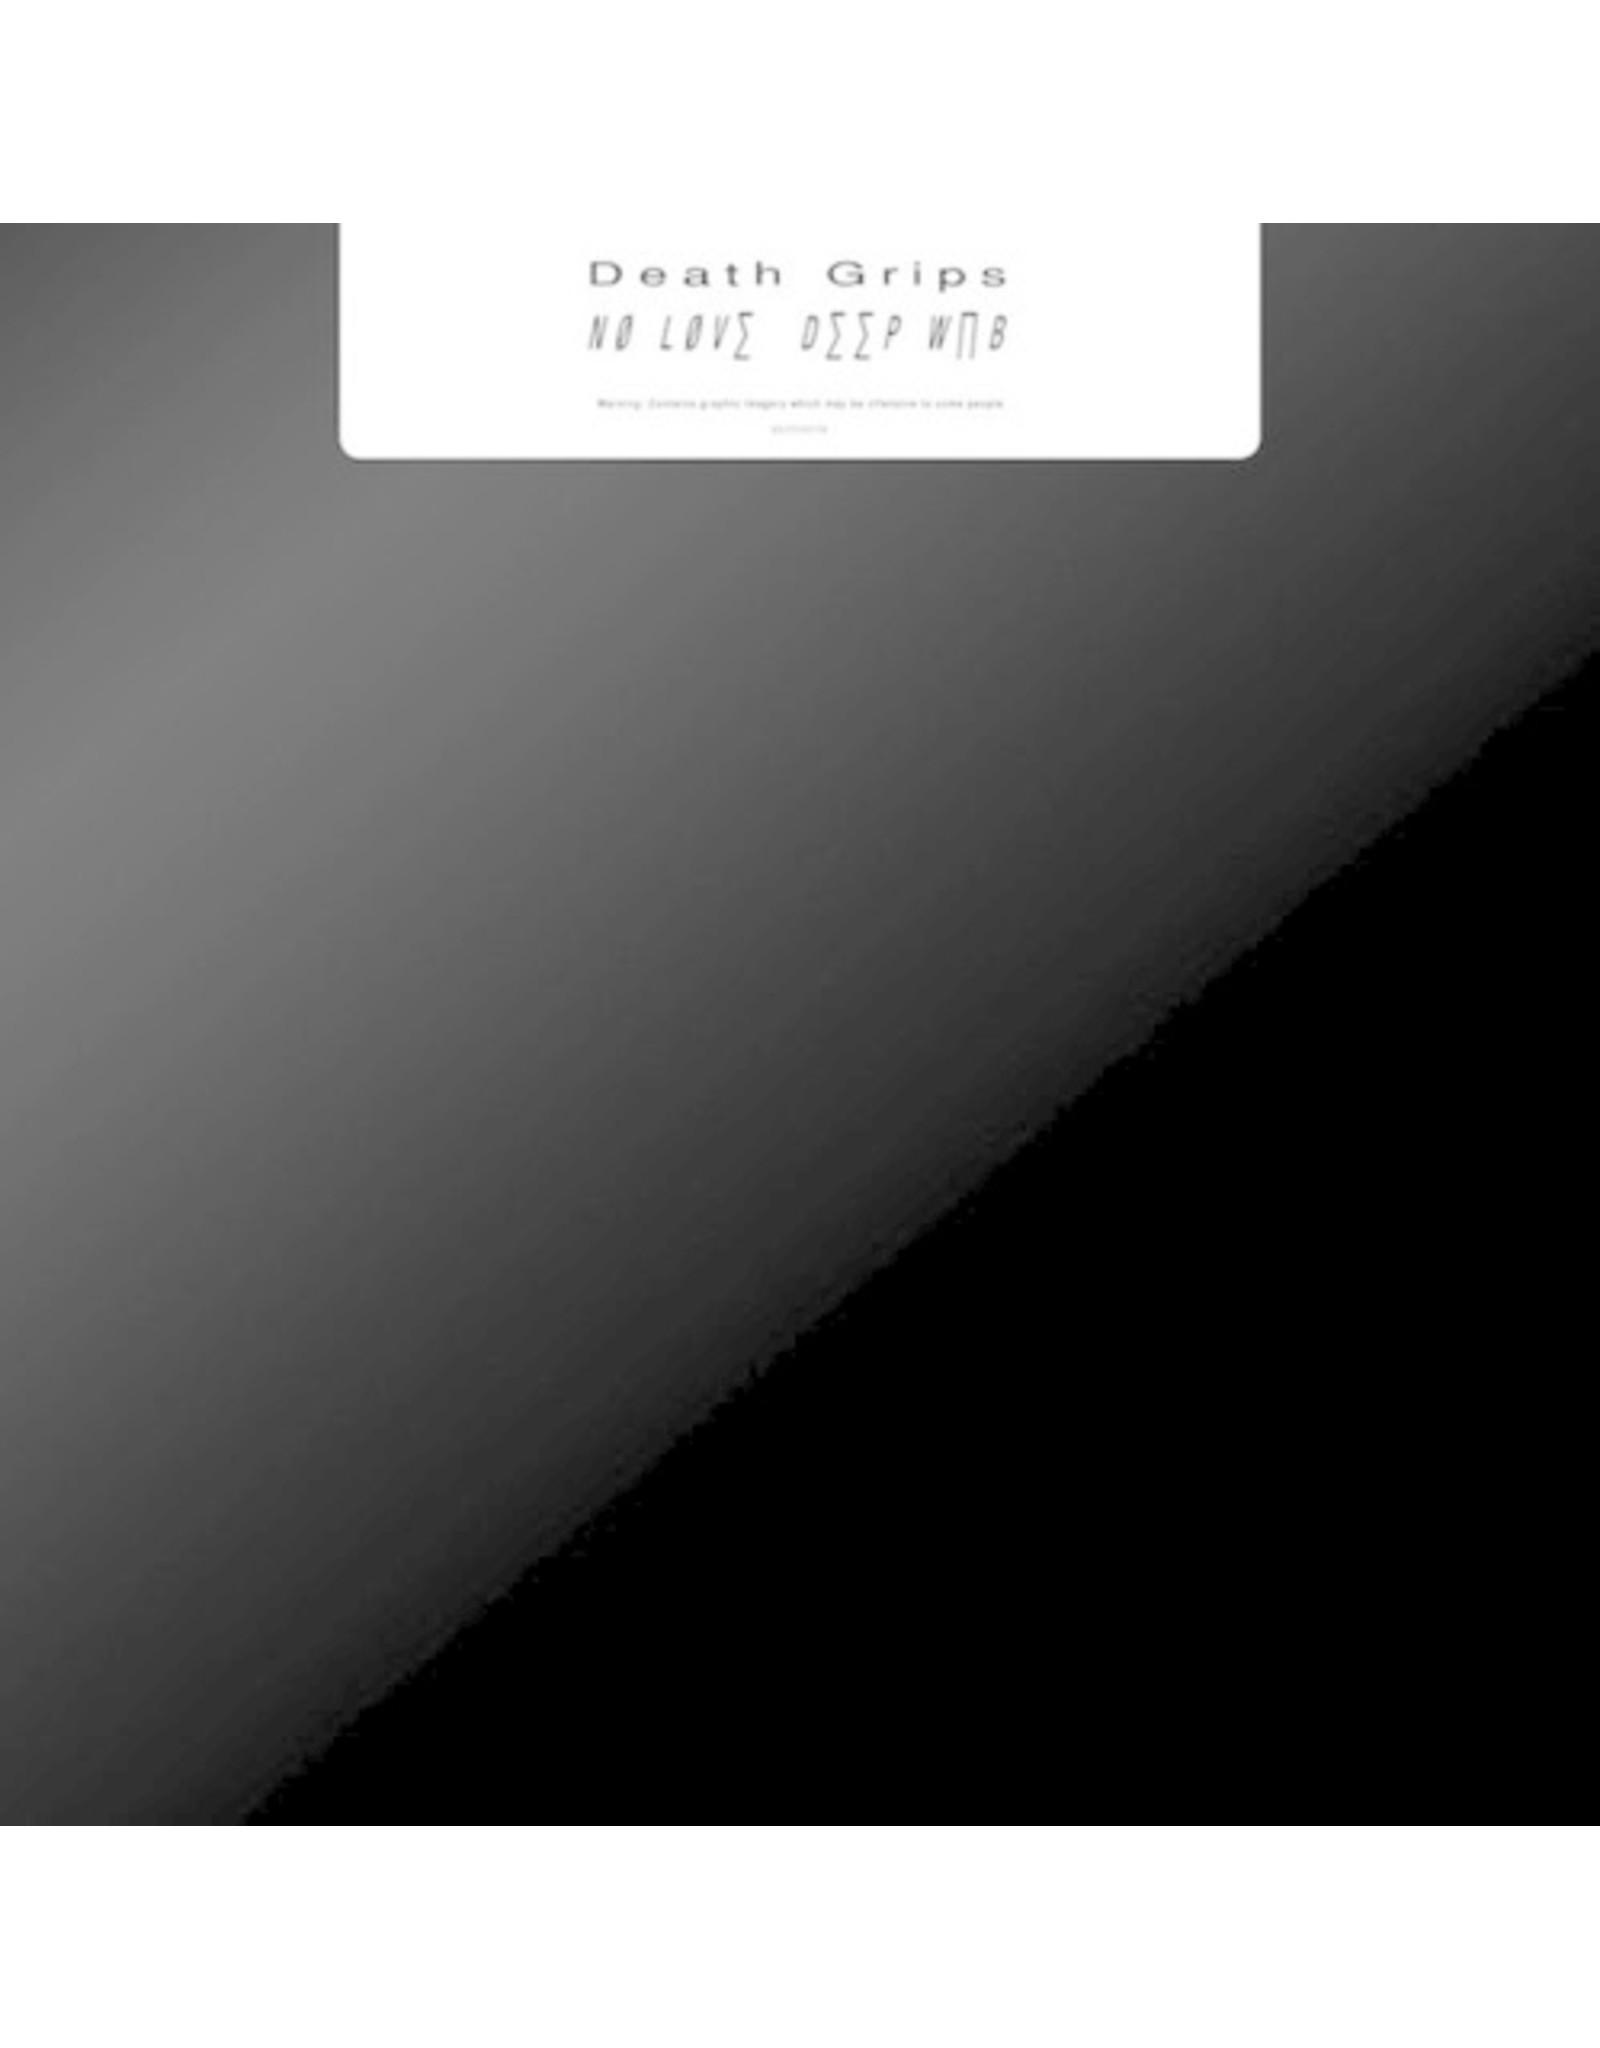 New Vinyl Death Grips - No Love Deep Web LP